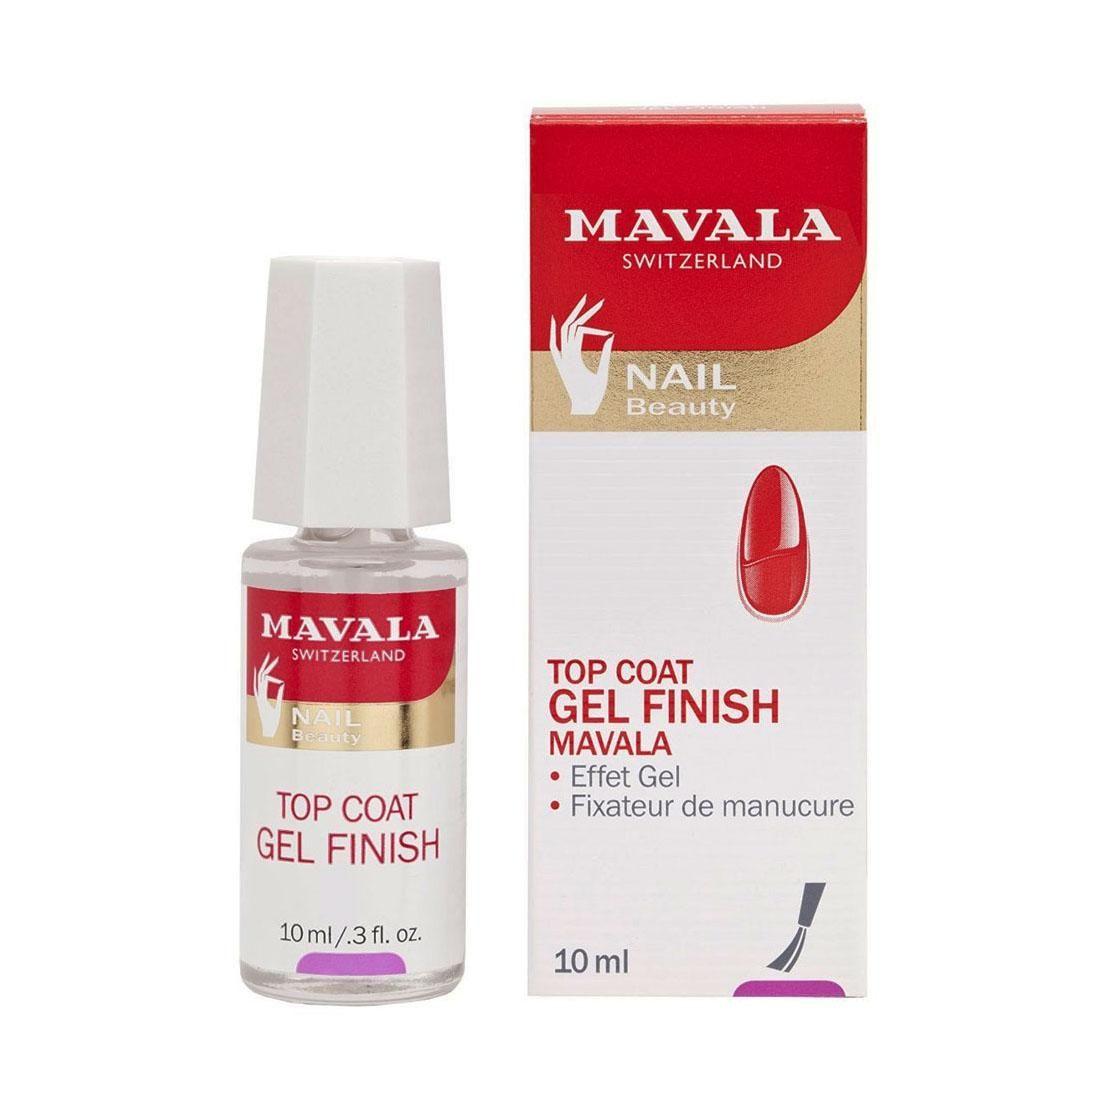 Mavala - Top Coat Gel Finish 10ml